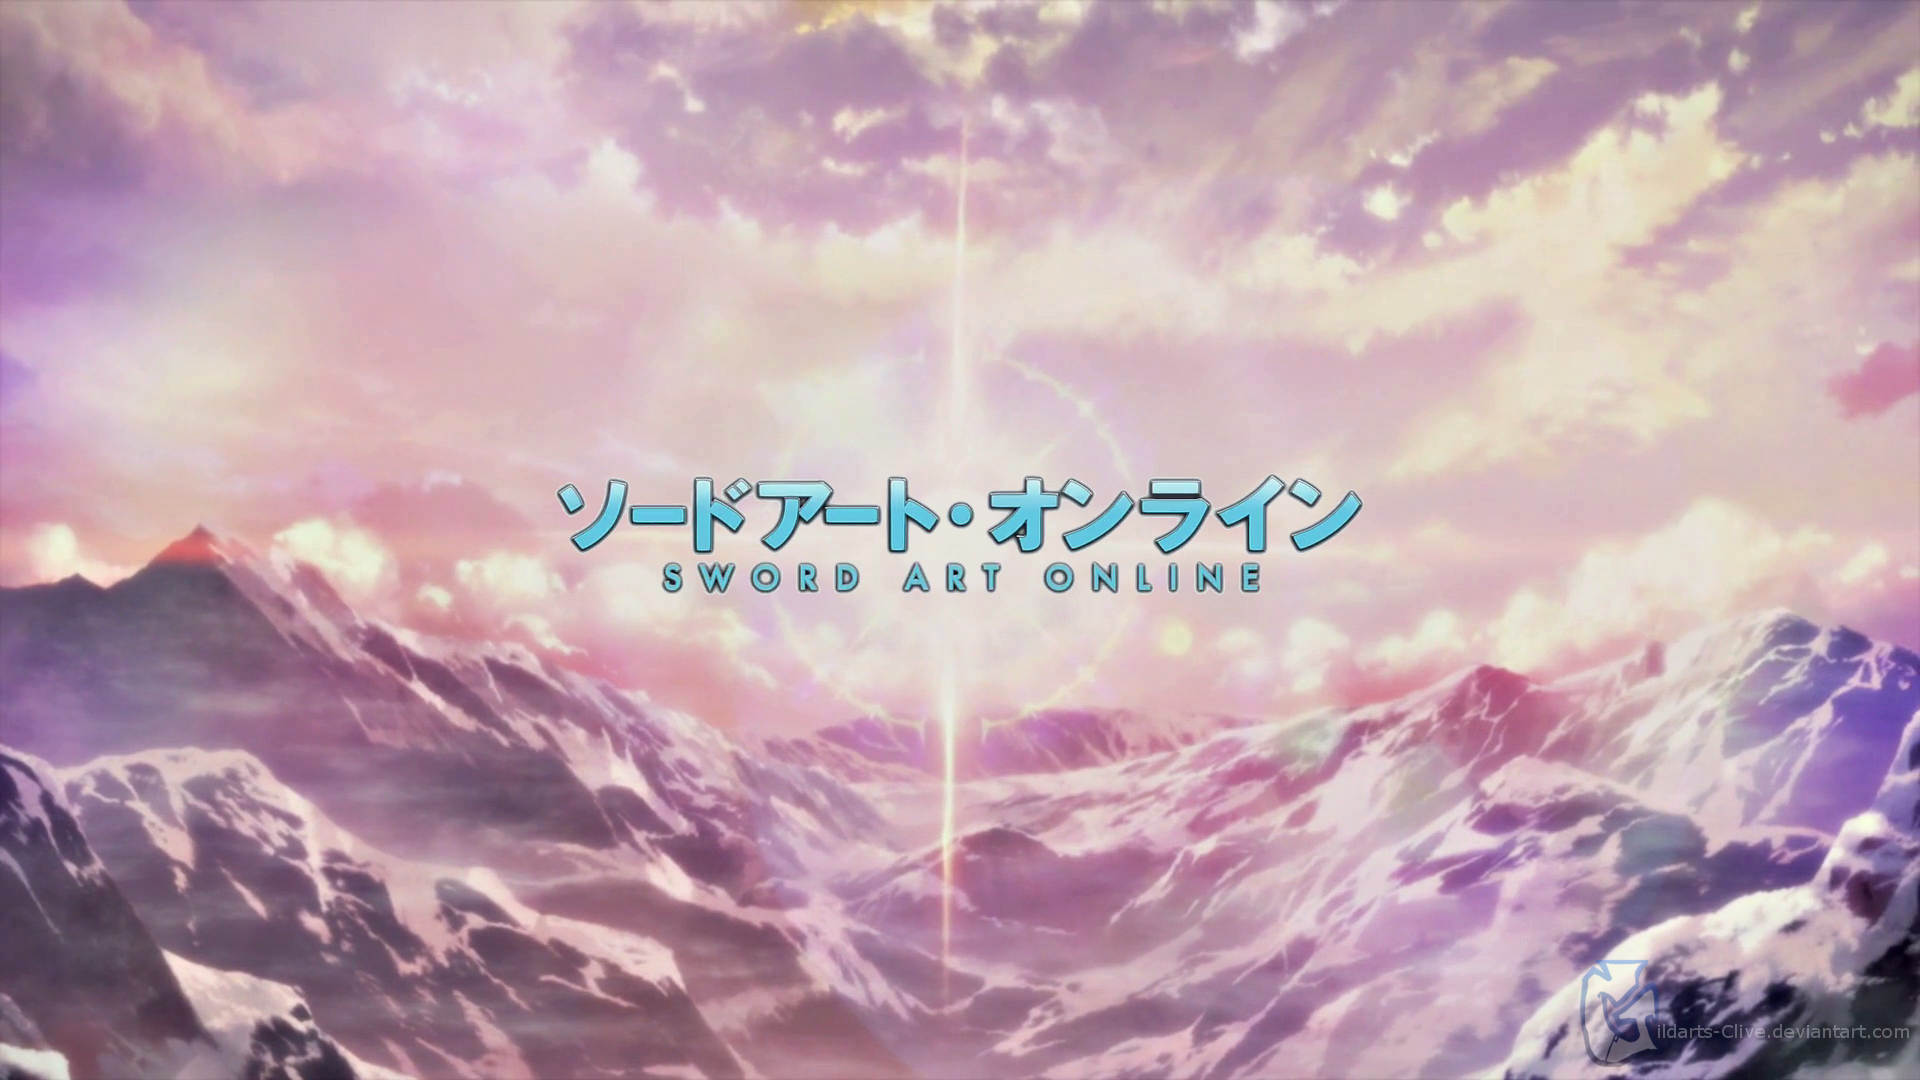 Image Sword Art Online Logo Landscape Anime Mountains Sword Art Online Sword Art Online Wallpaper Sword Art